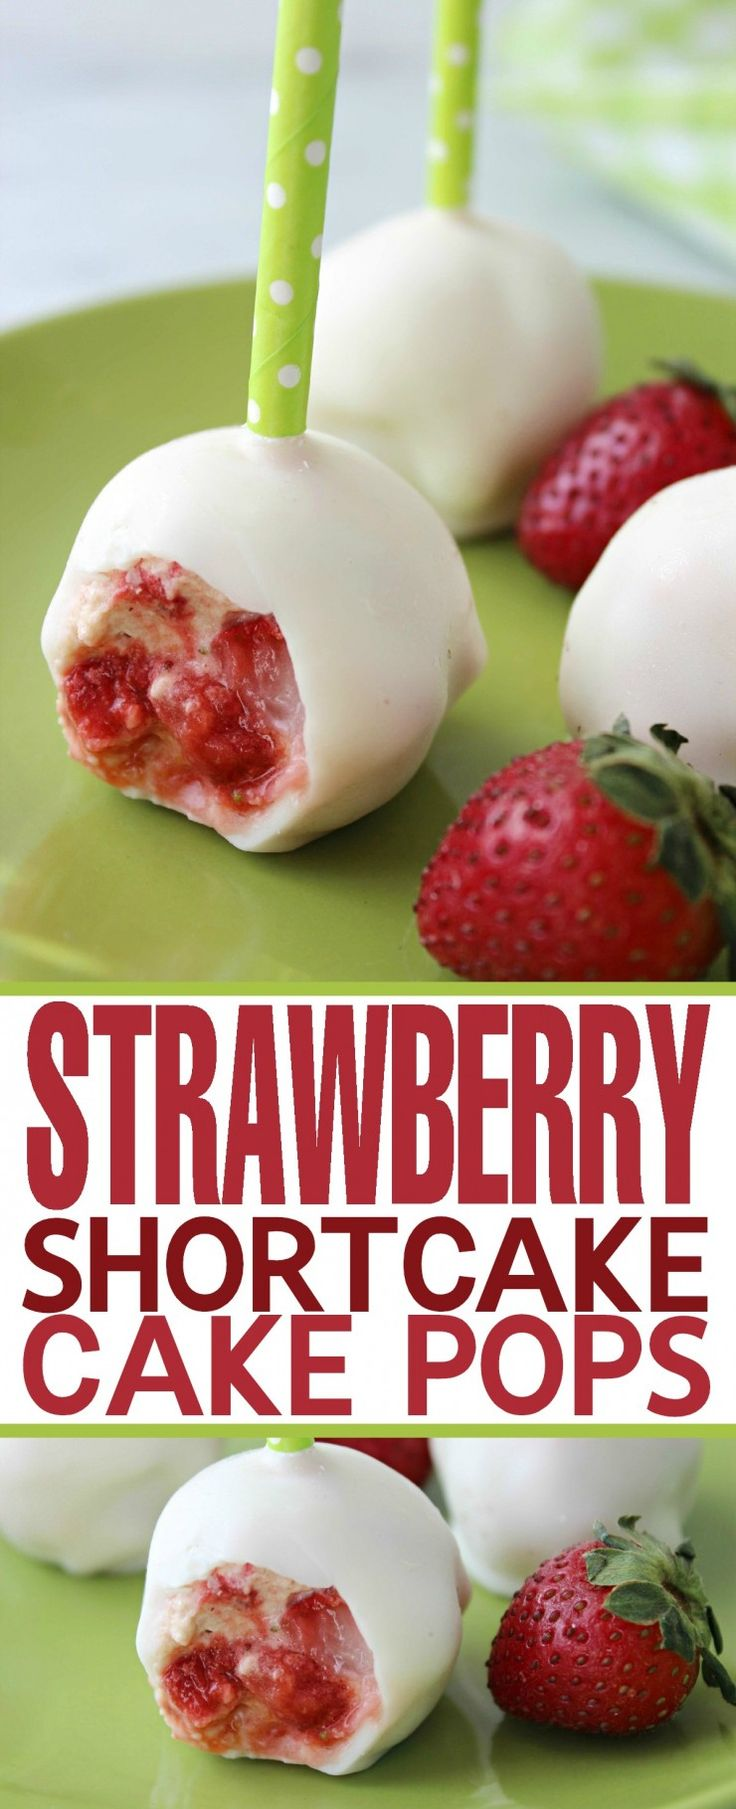 Strawberry Shortcake Cake Pops 4131 best Cake